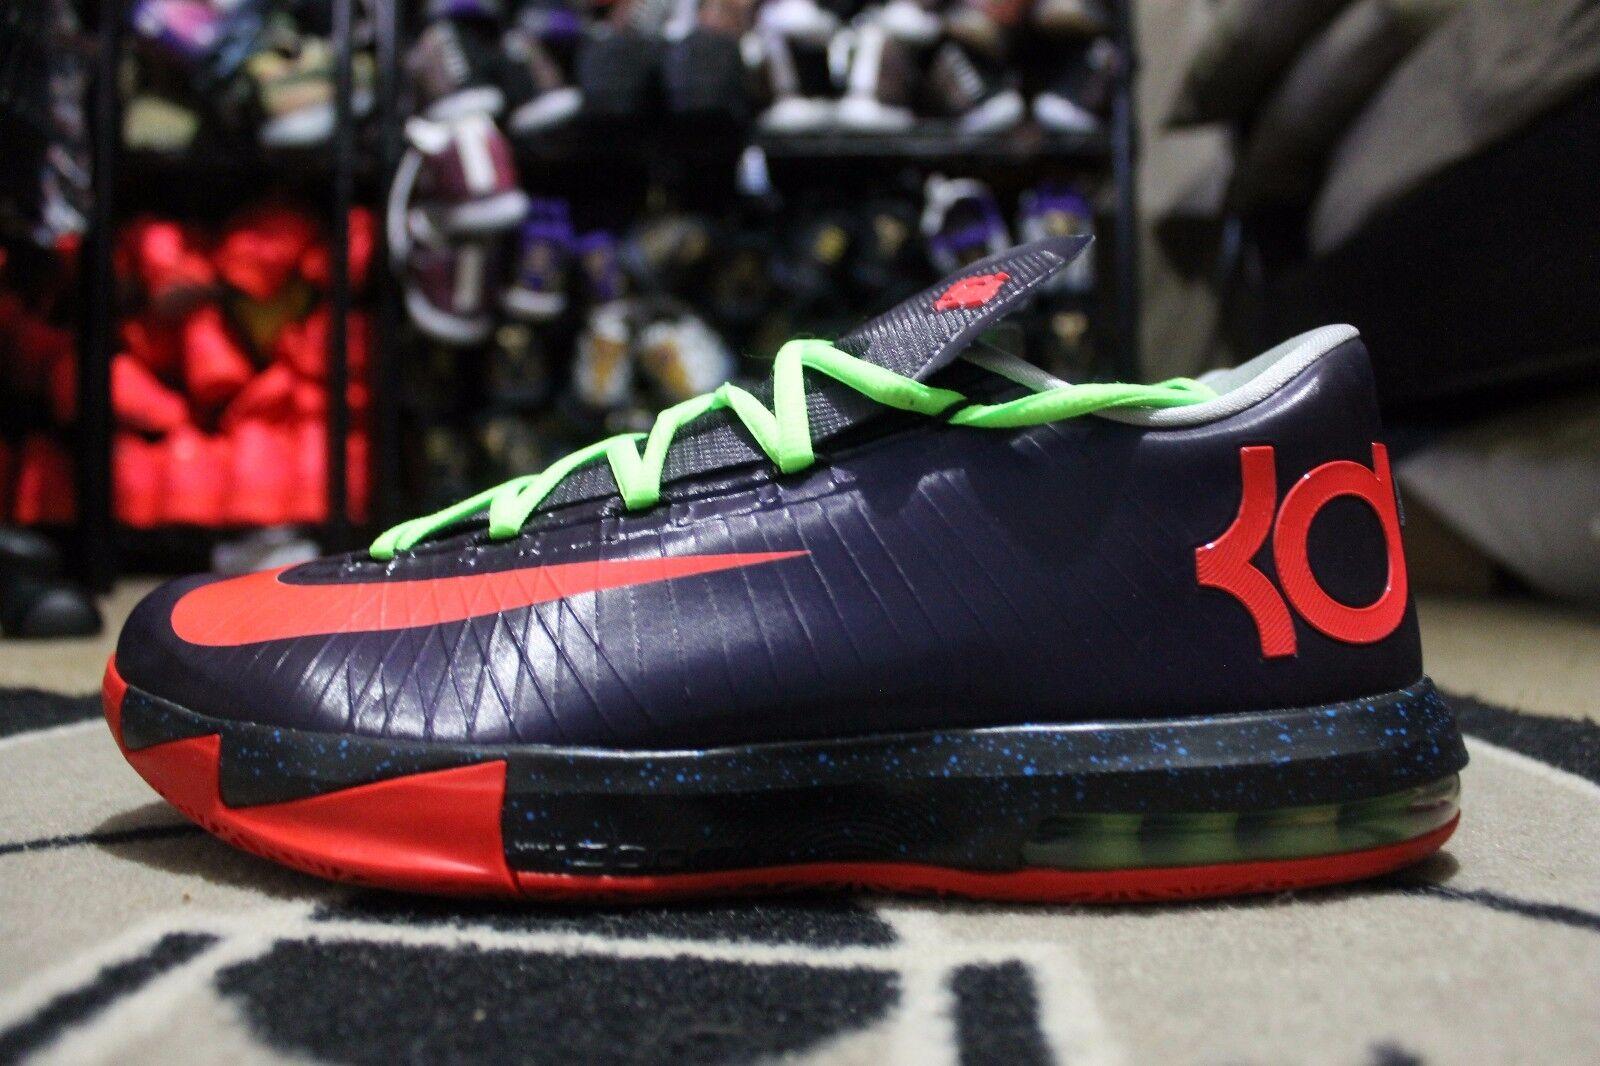 New Nike KD VI 6 Nike iD Nerf Purple neon White Size 11